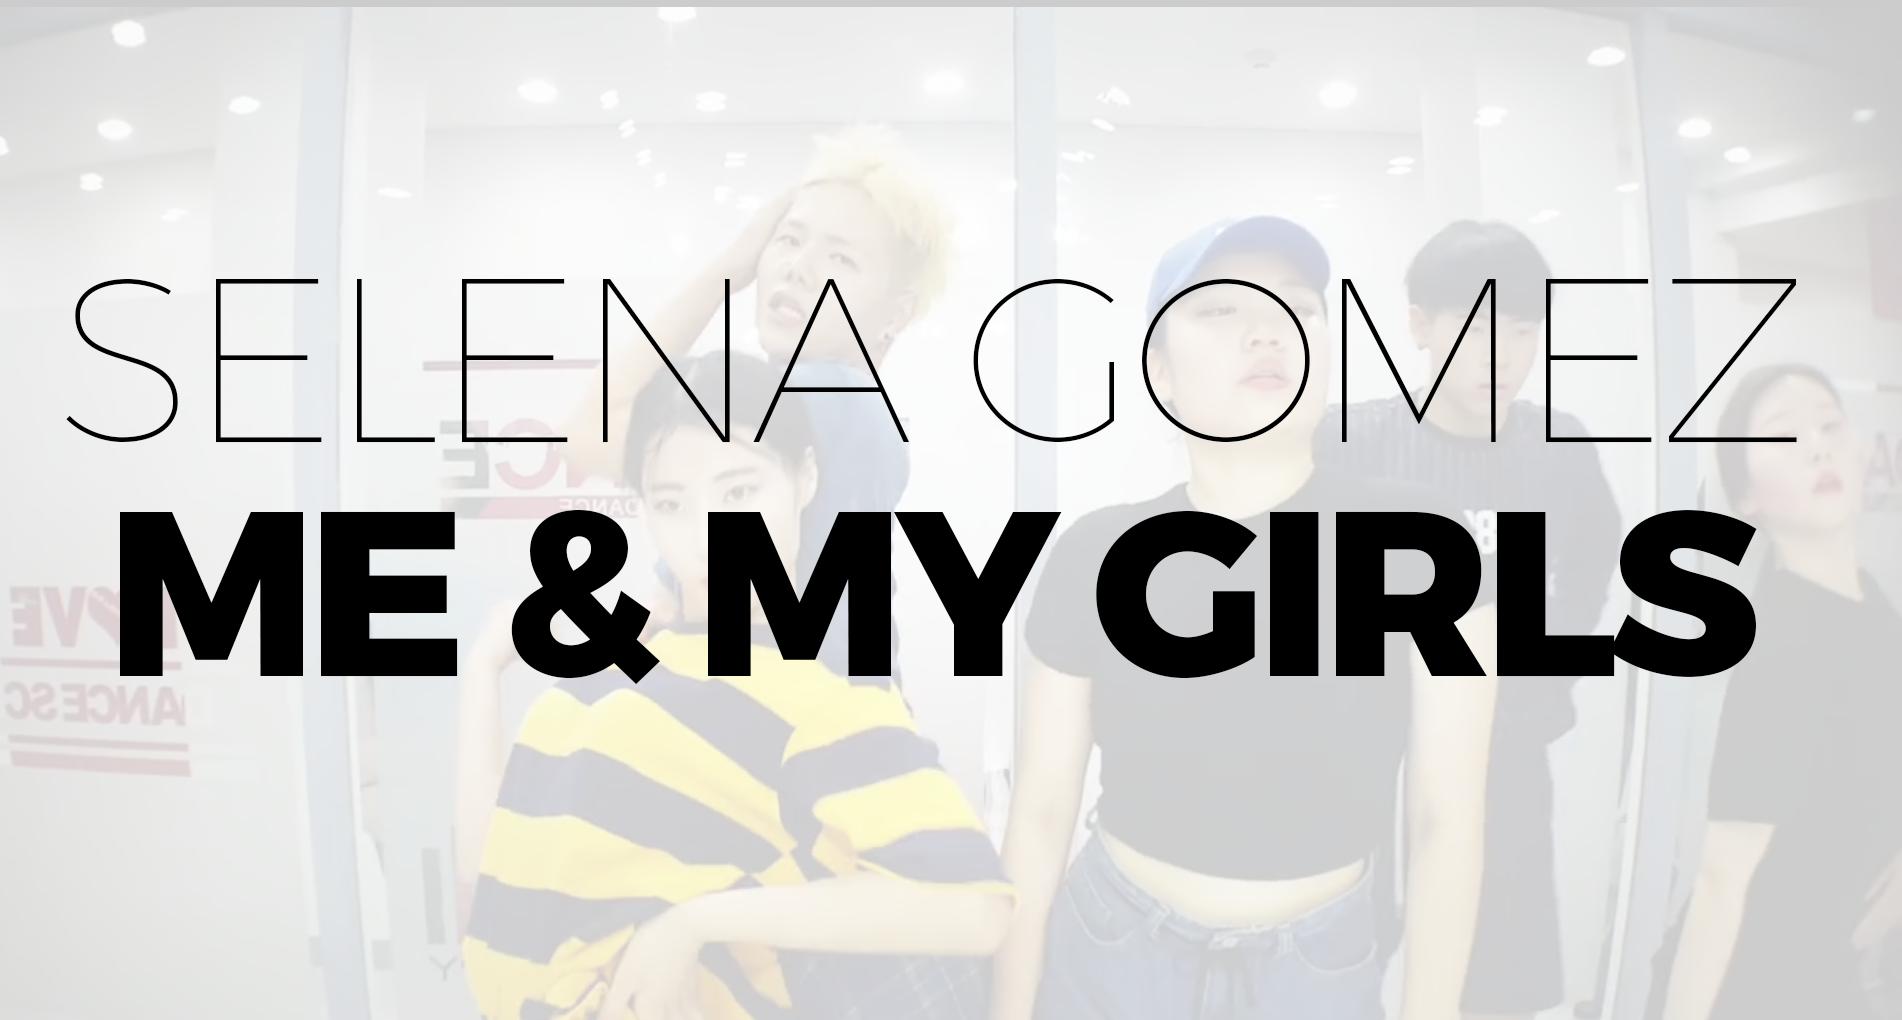 Selena gomez – Me & My girls (Choreography. Blazer Pyo)